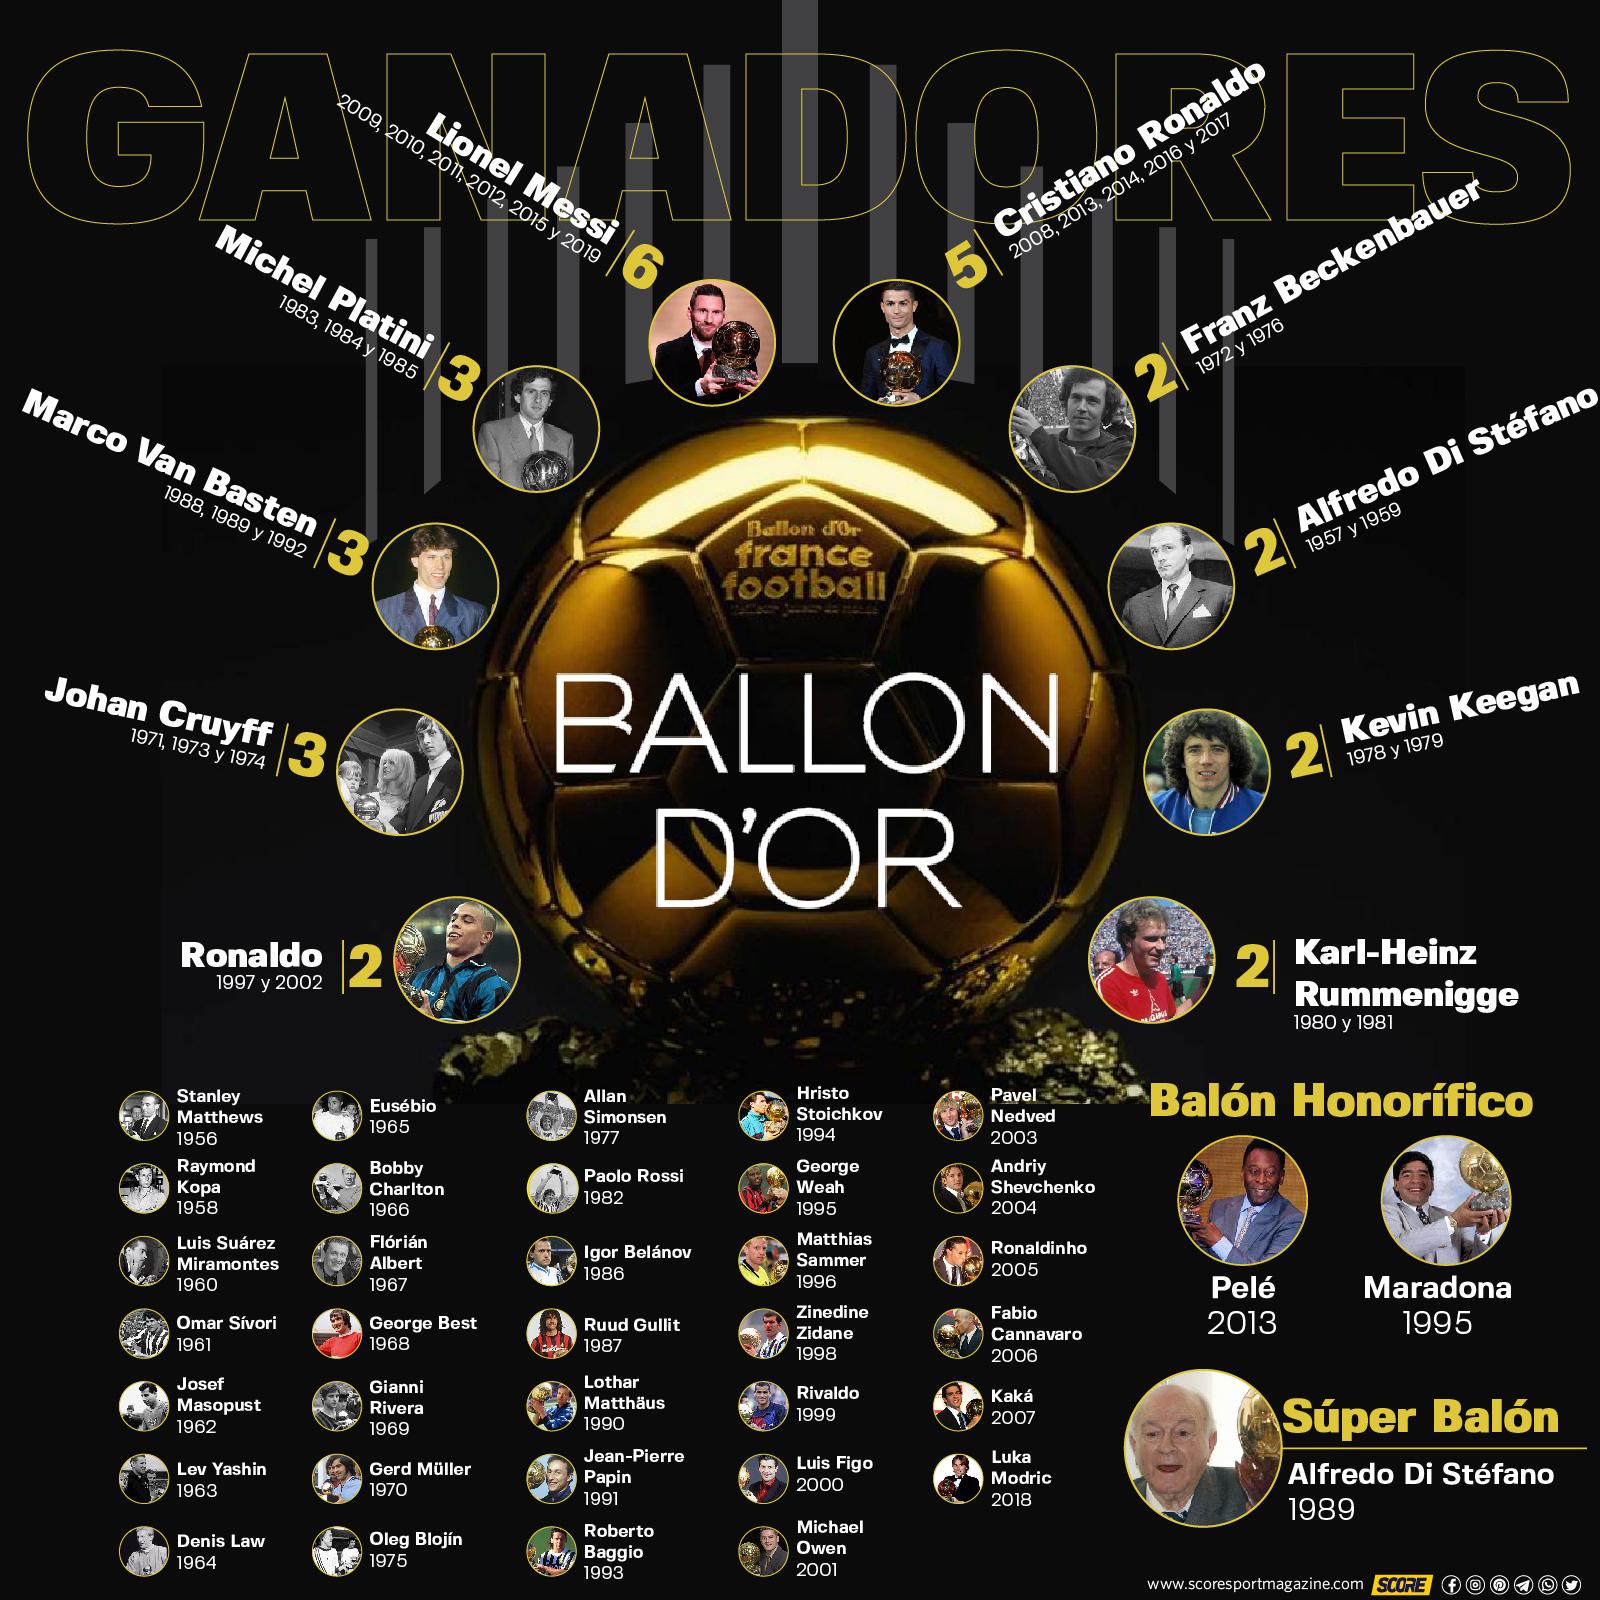 Ganadores del Balón de Oro-infografía